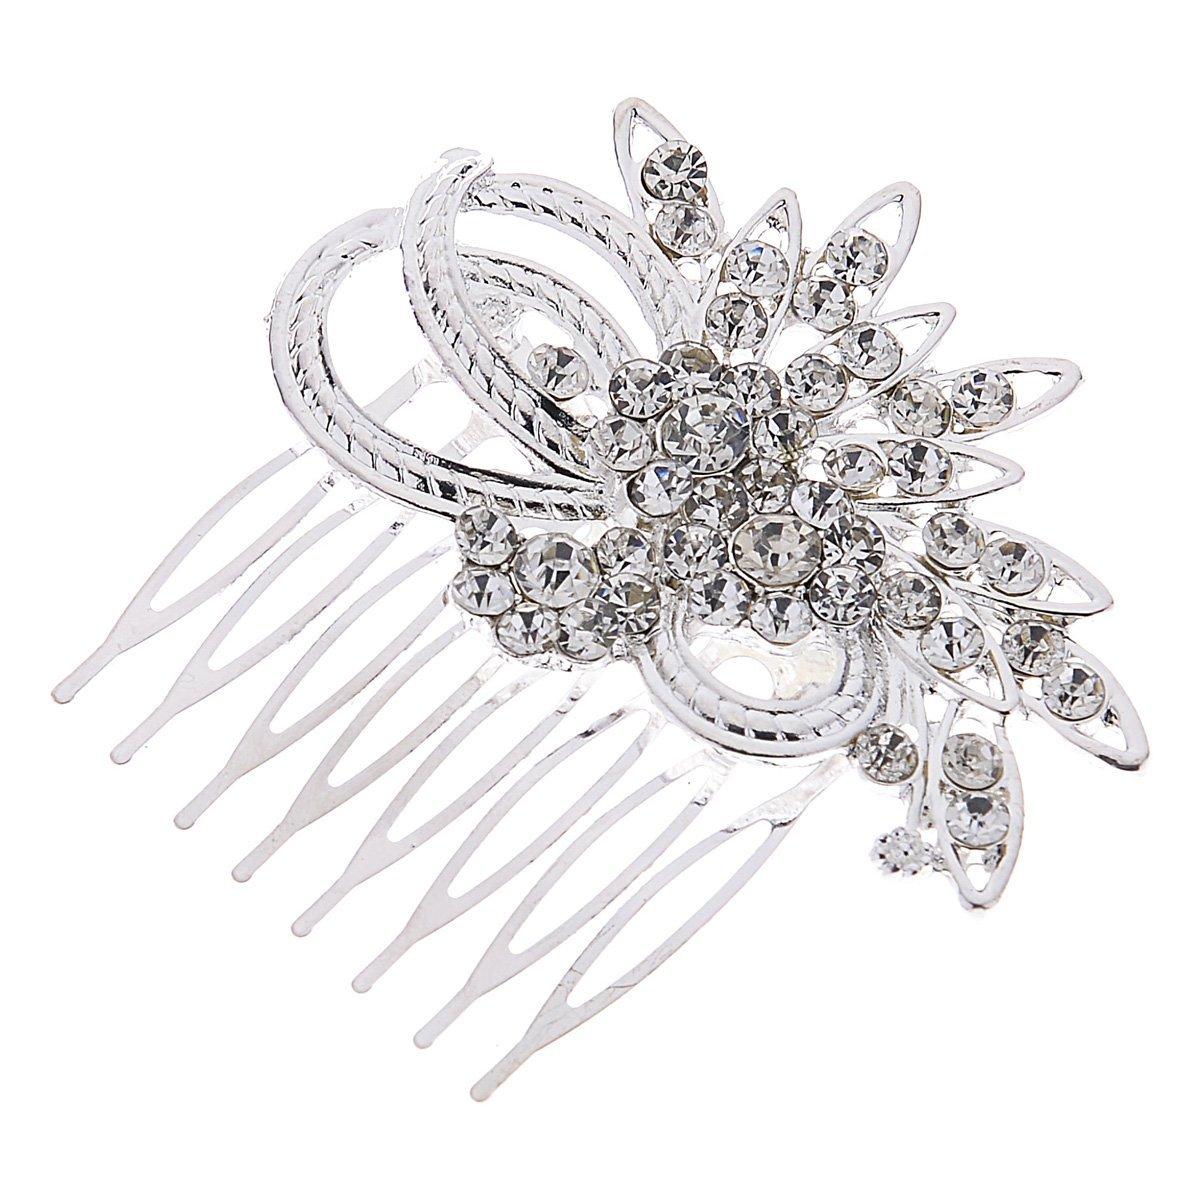 Remedios Vintage Crystal Bridal Hair Comb Wedding Hair Accessory, Silver LWCAFS160043CP12